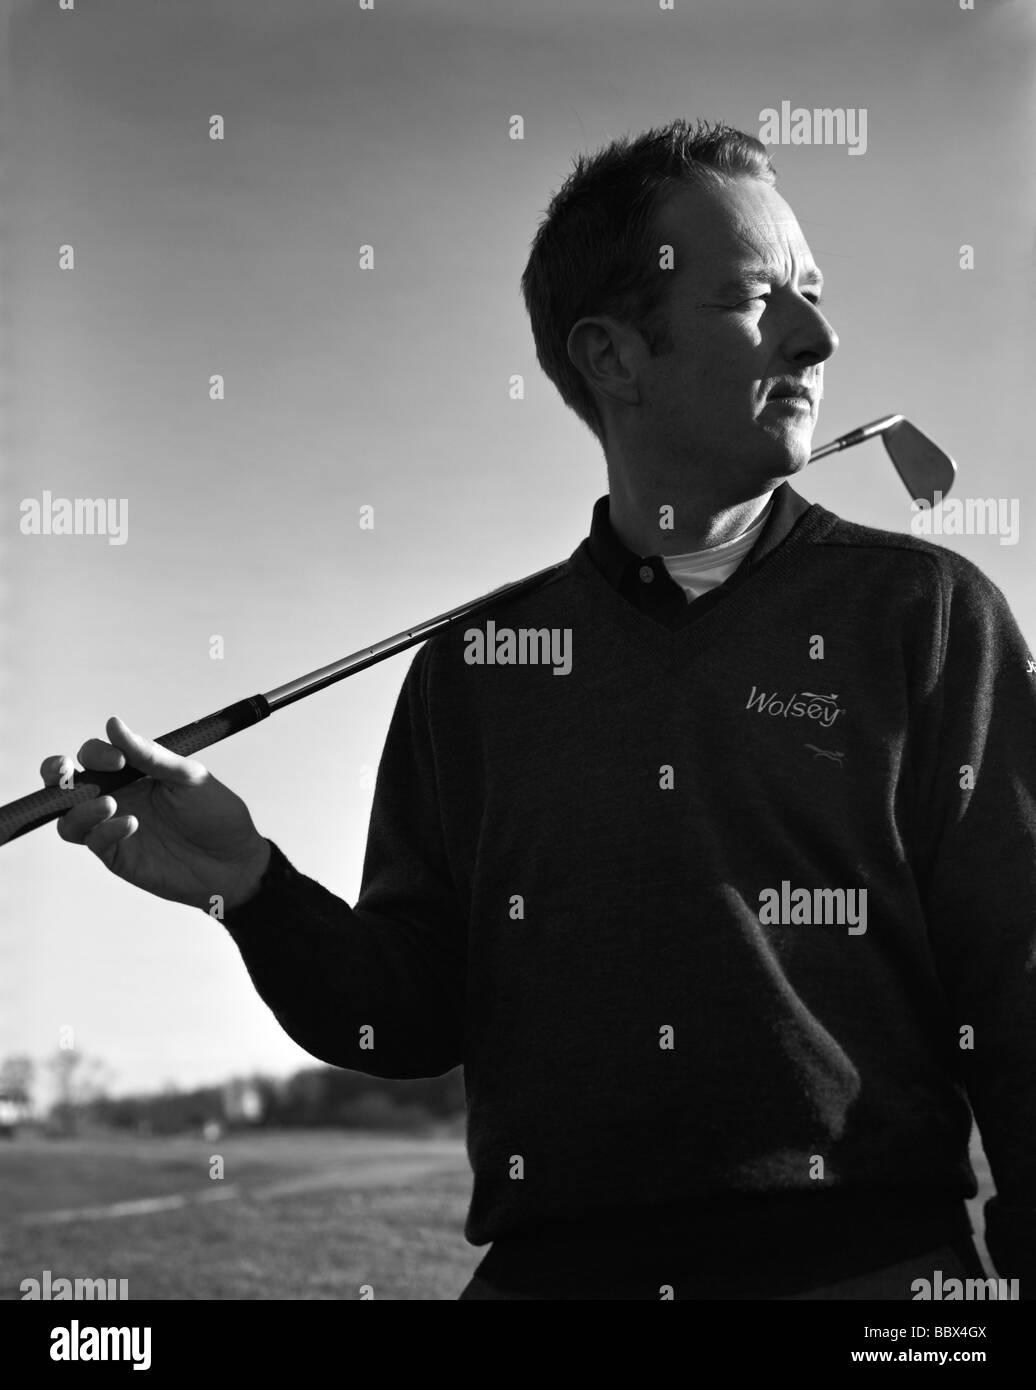 Portrait of a golfer Sweden. - Stock Image